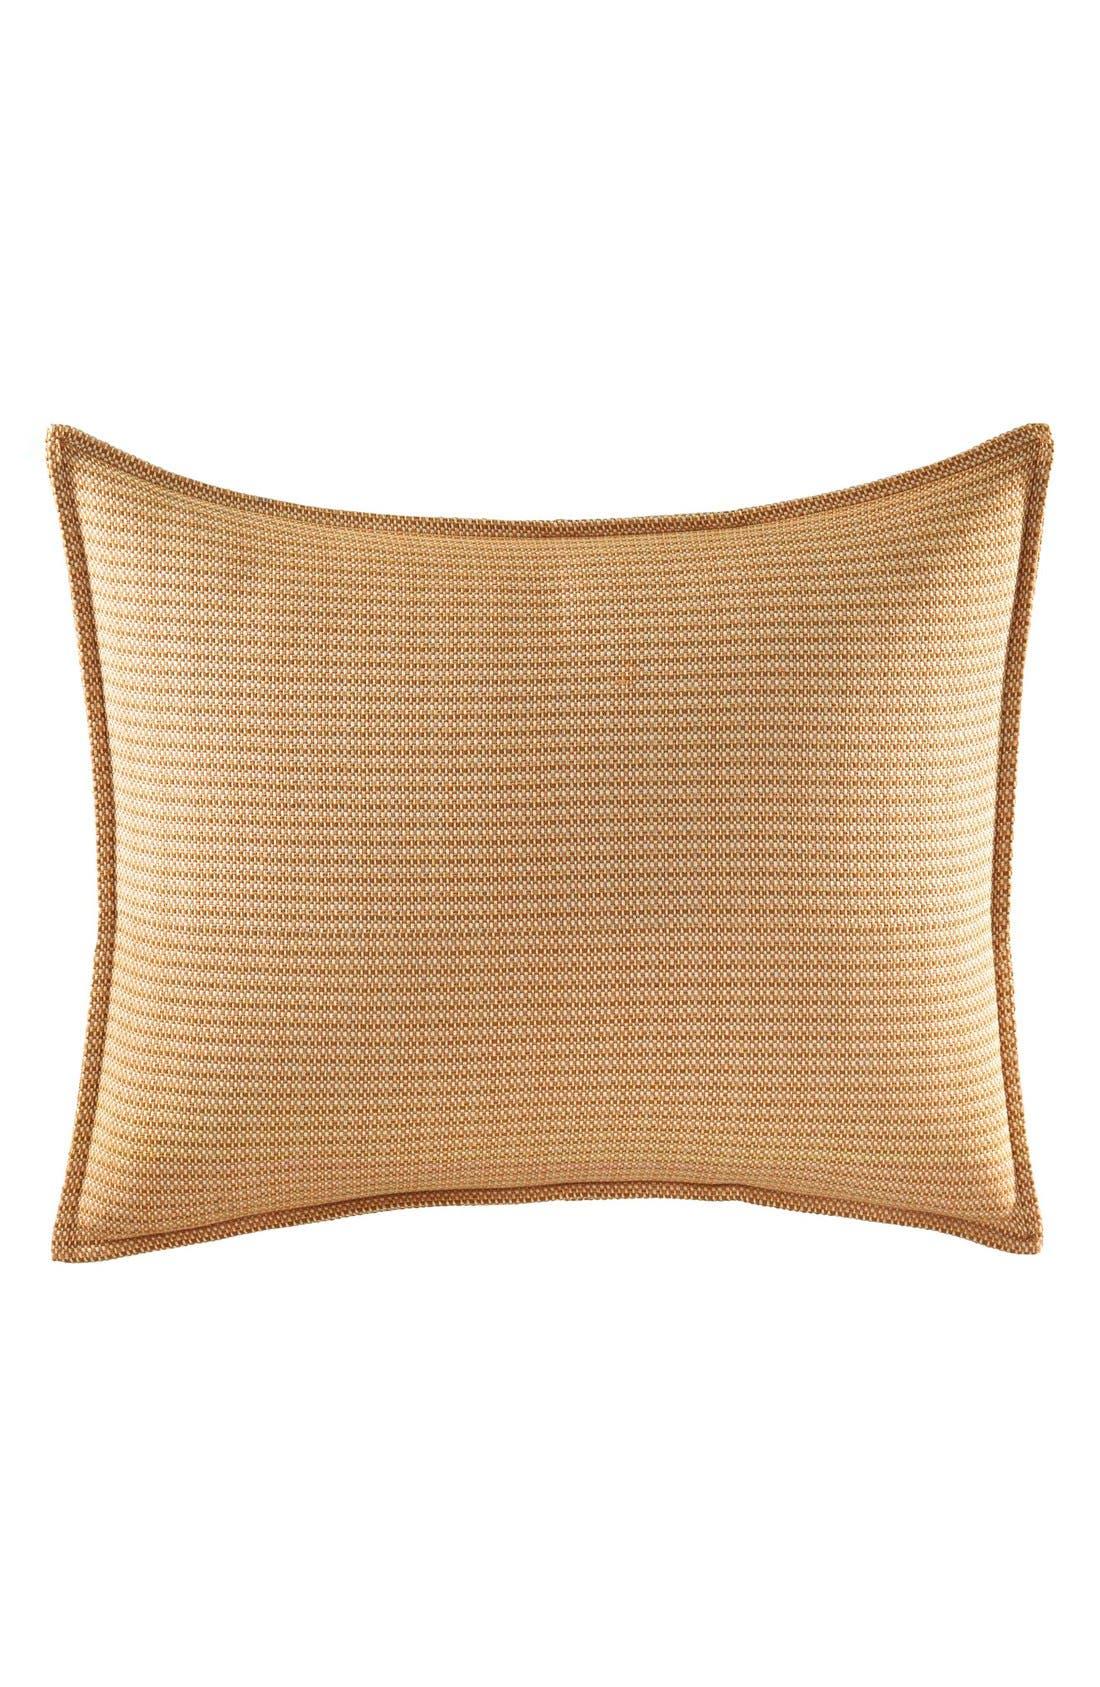 Cayo Coco Pillow,                         Main,                         color,